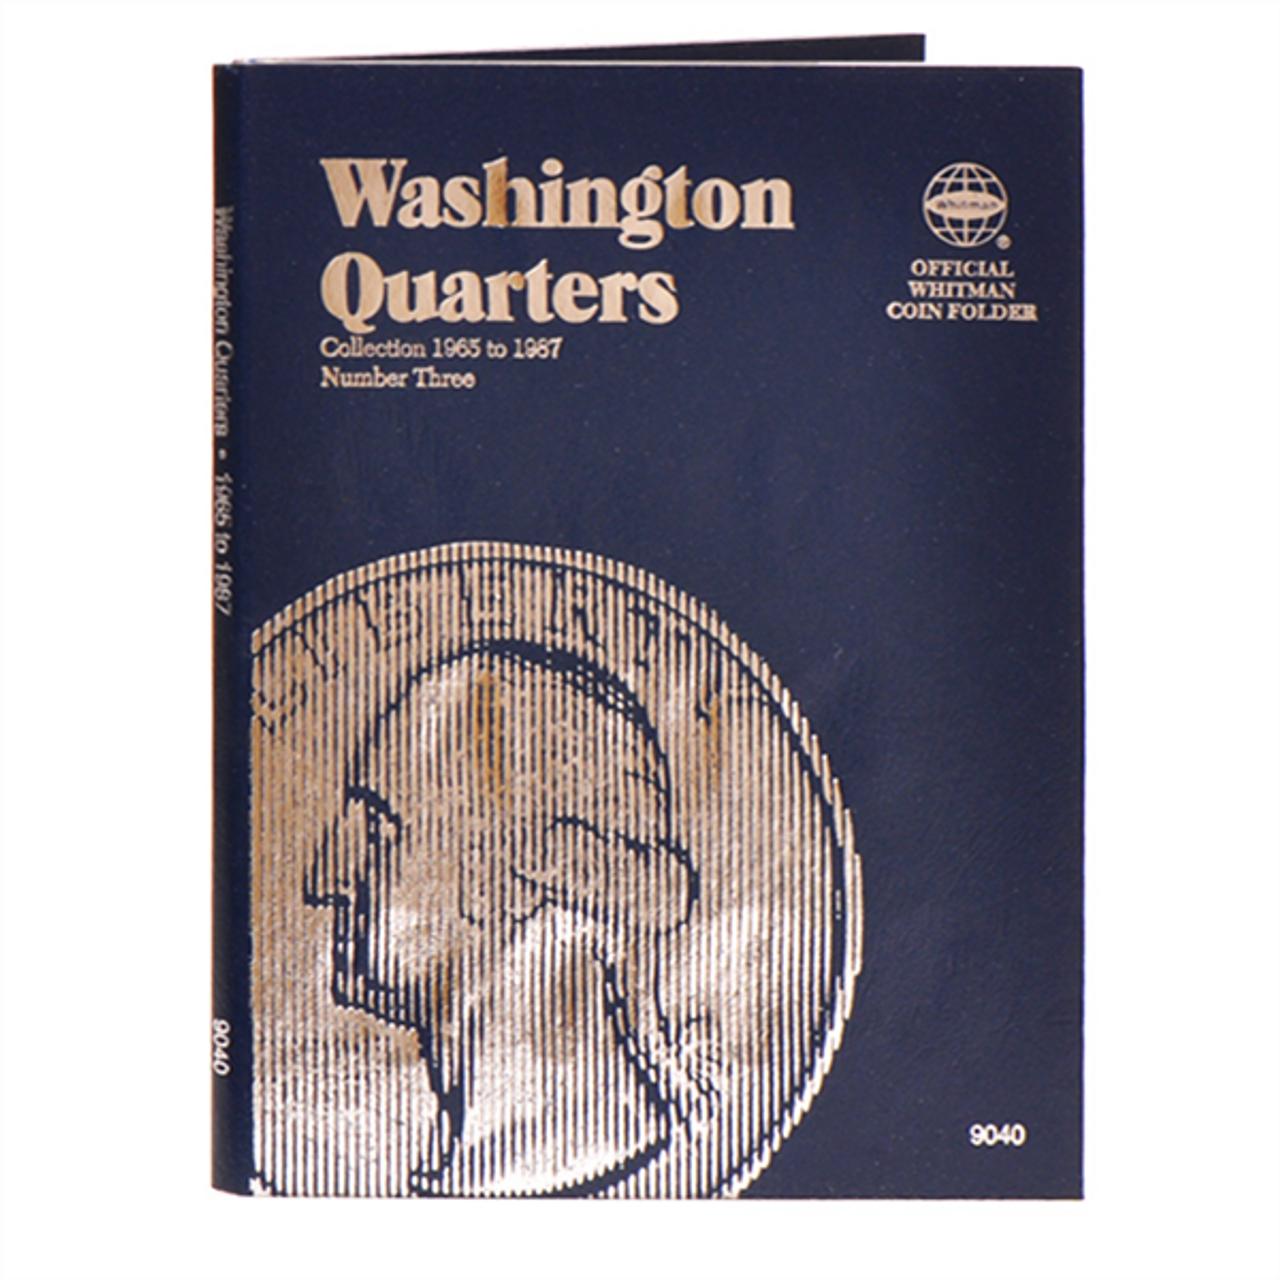 #3 Washington Quarter  Album 1965-1987